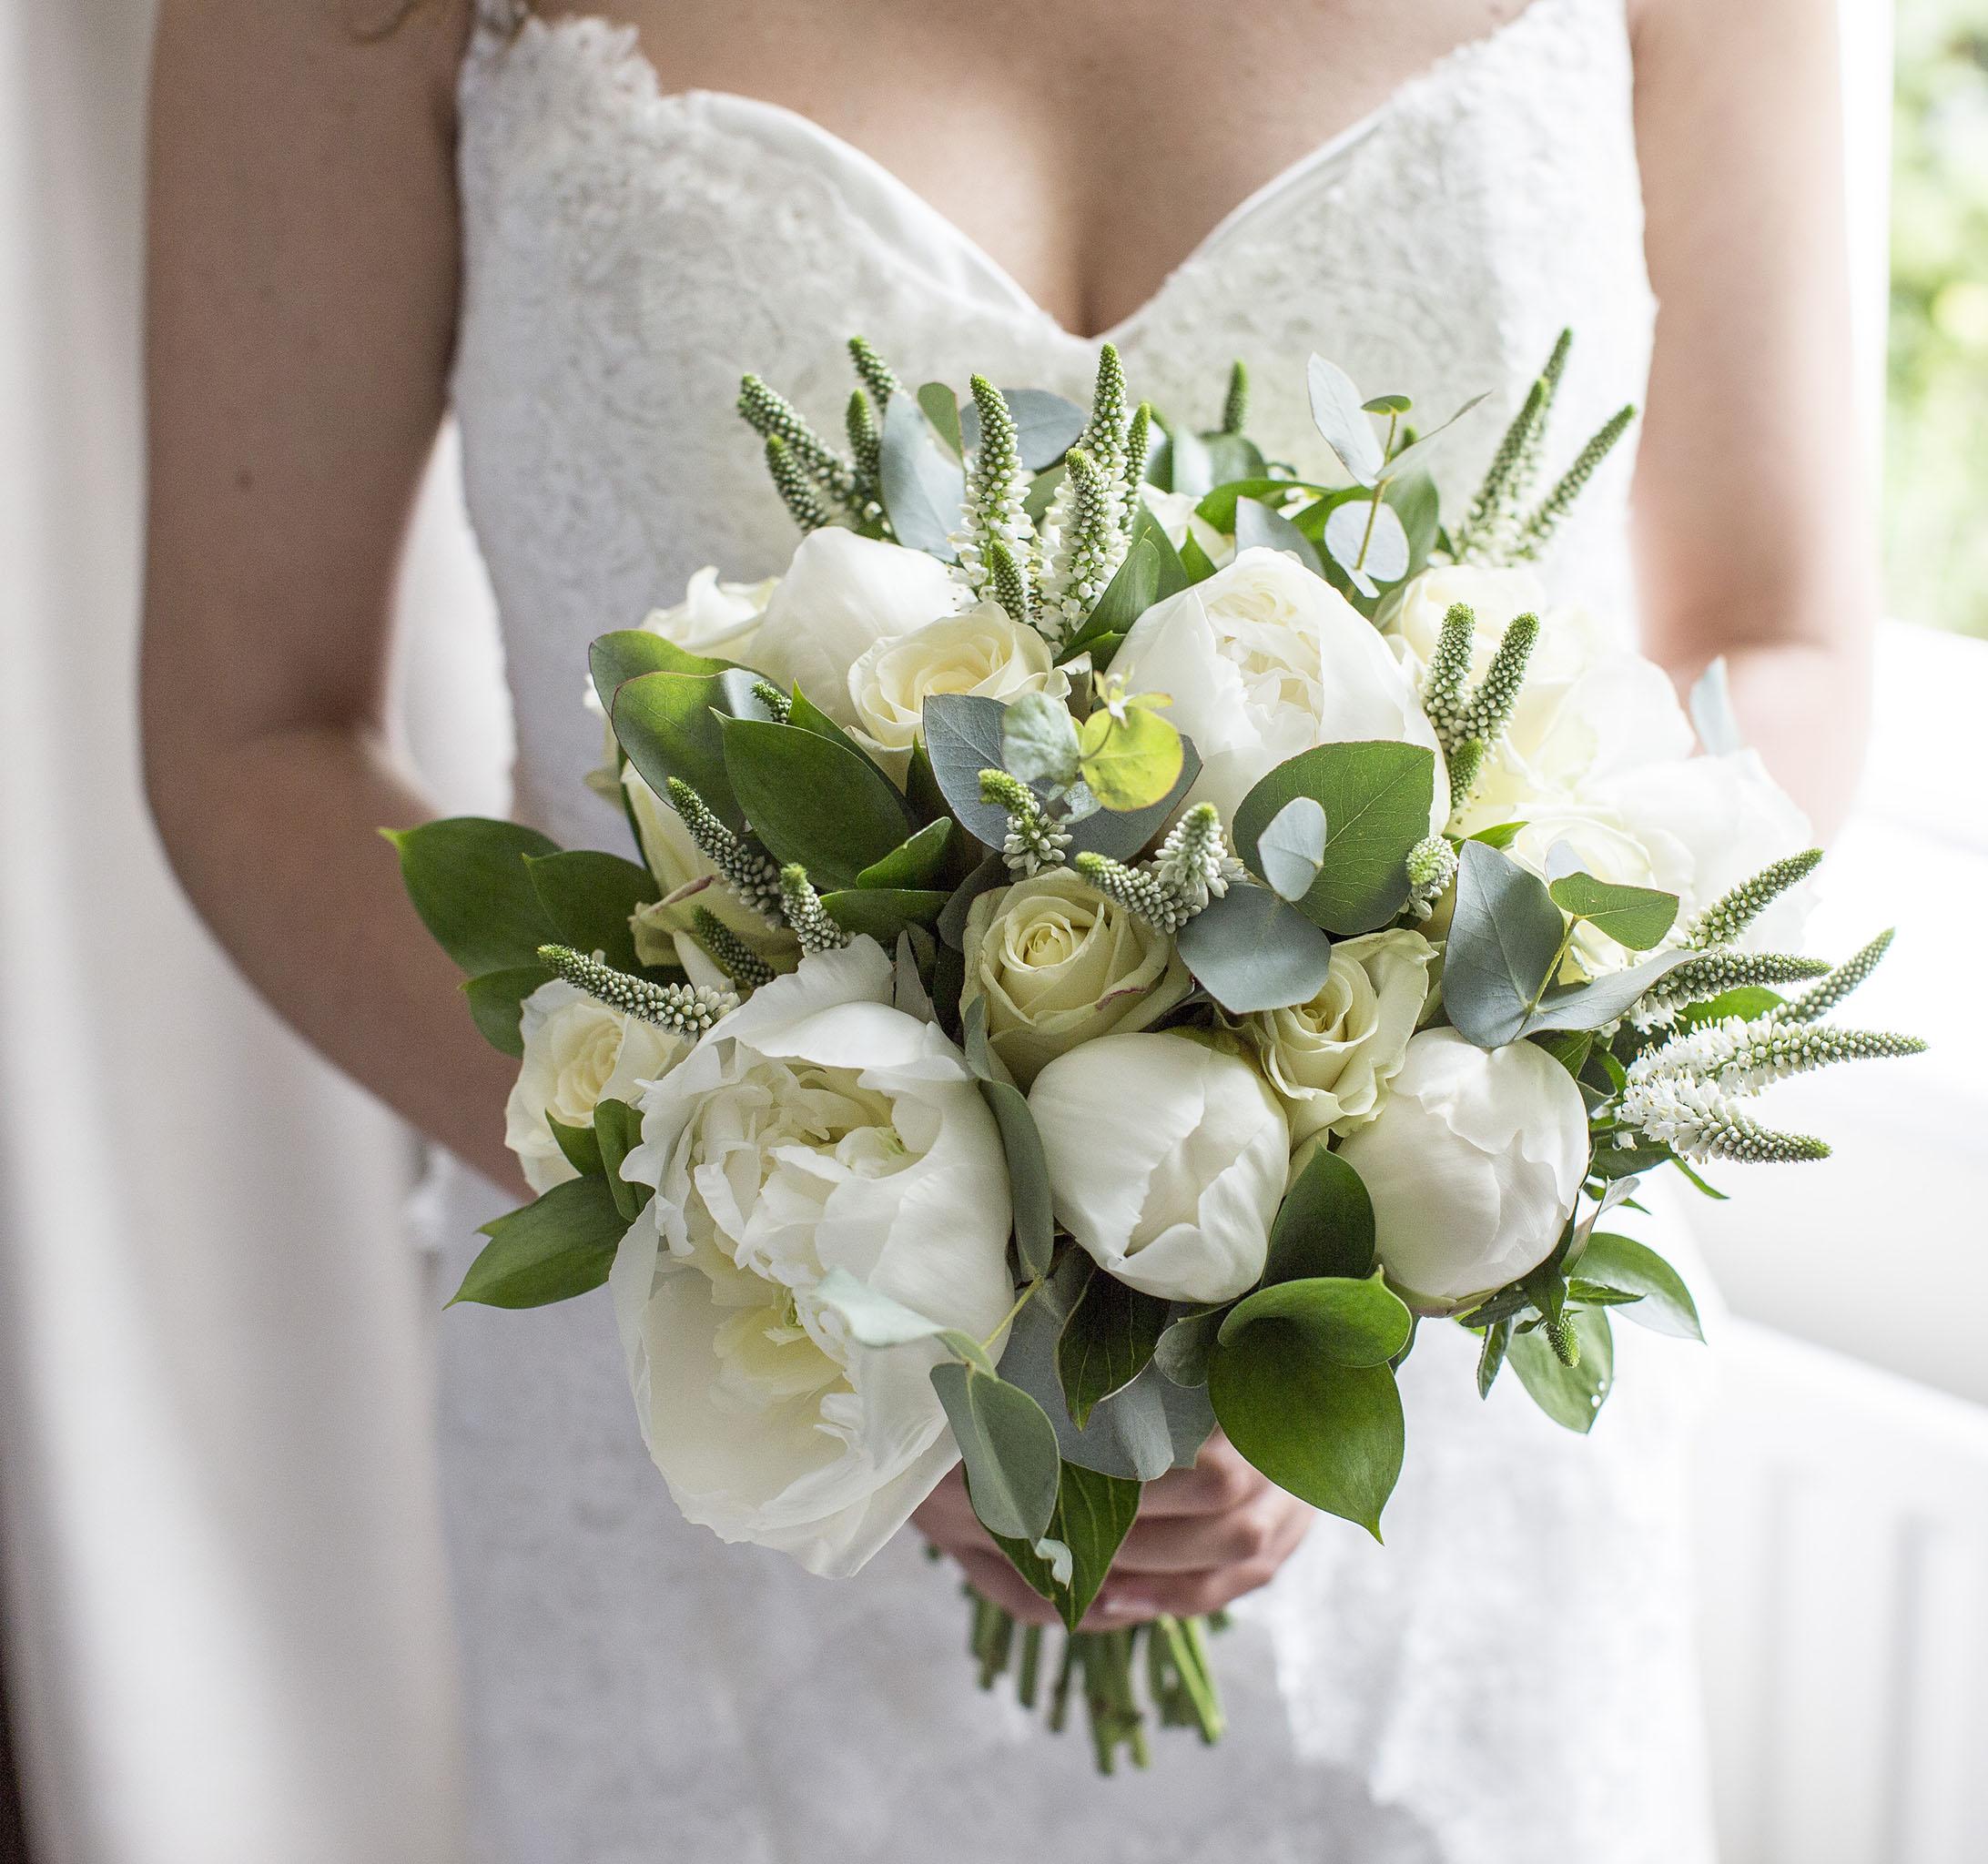 elizabethgphotography_kingslangley_hertfordshire_fineart_wedding_enfield_ricky_nicole_nahlis_12.jpg